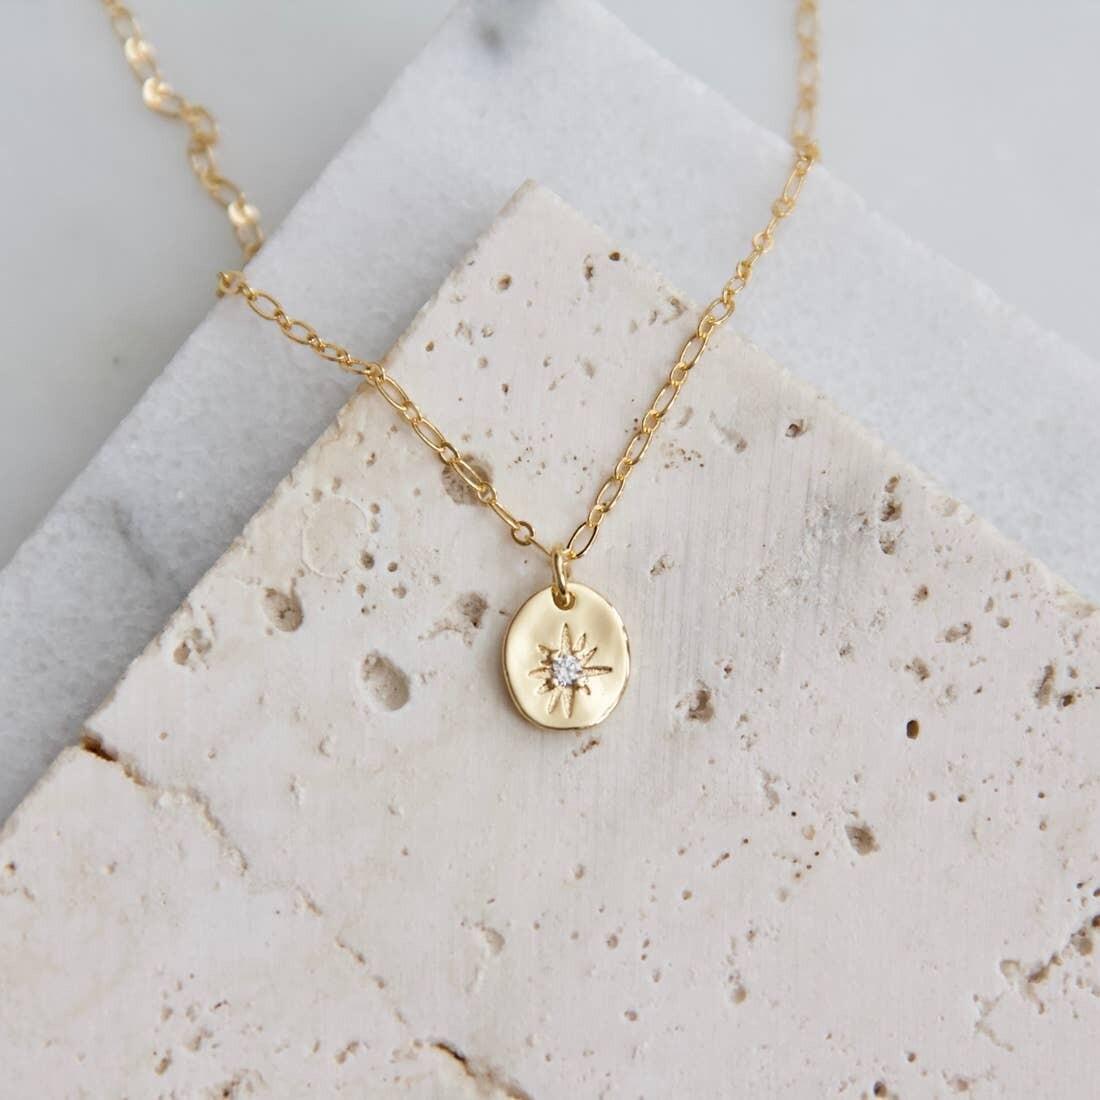 Oval Star Necklace